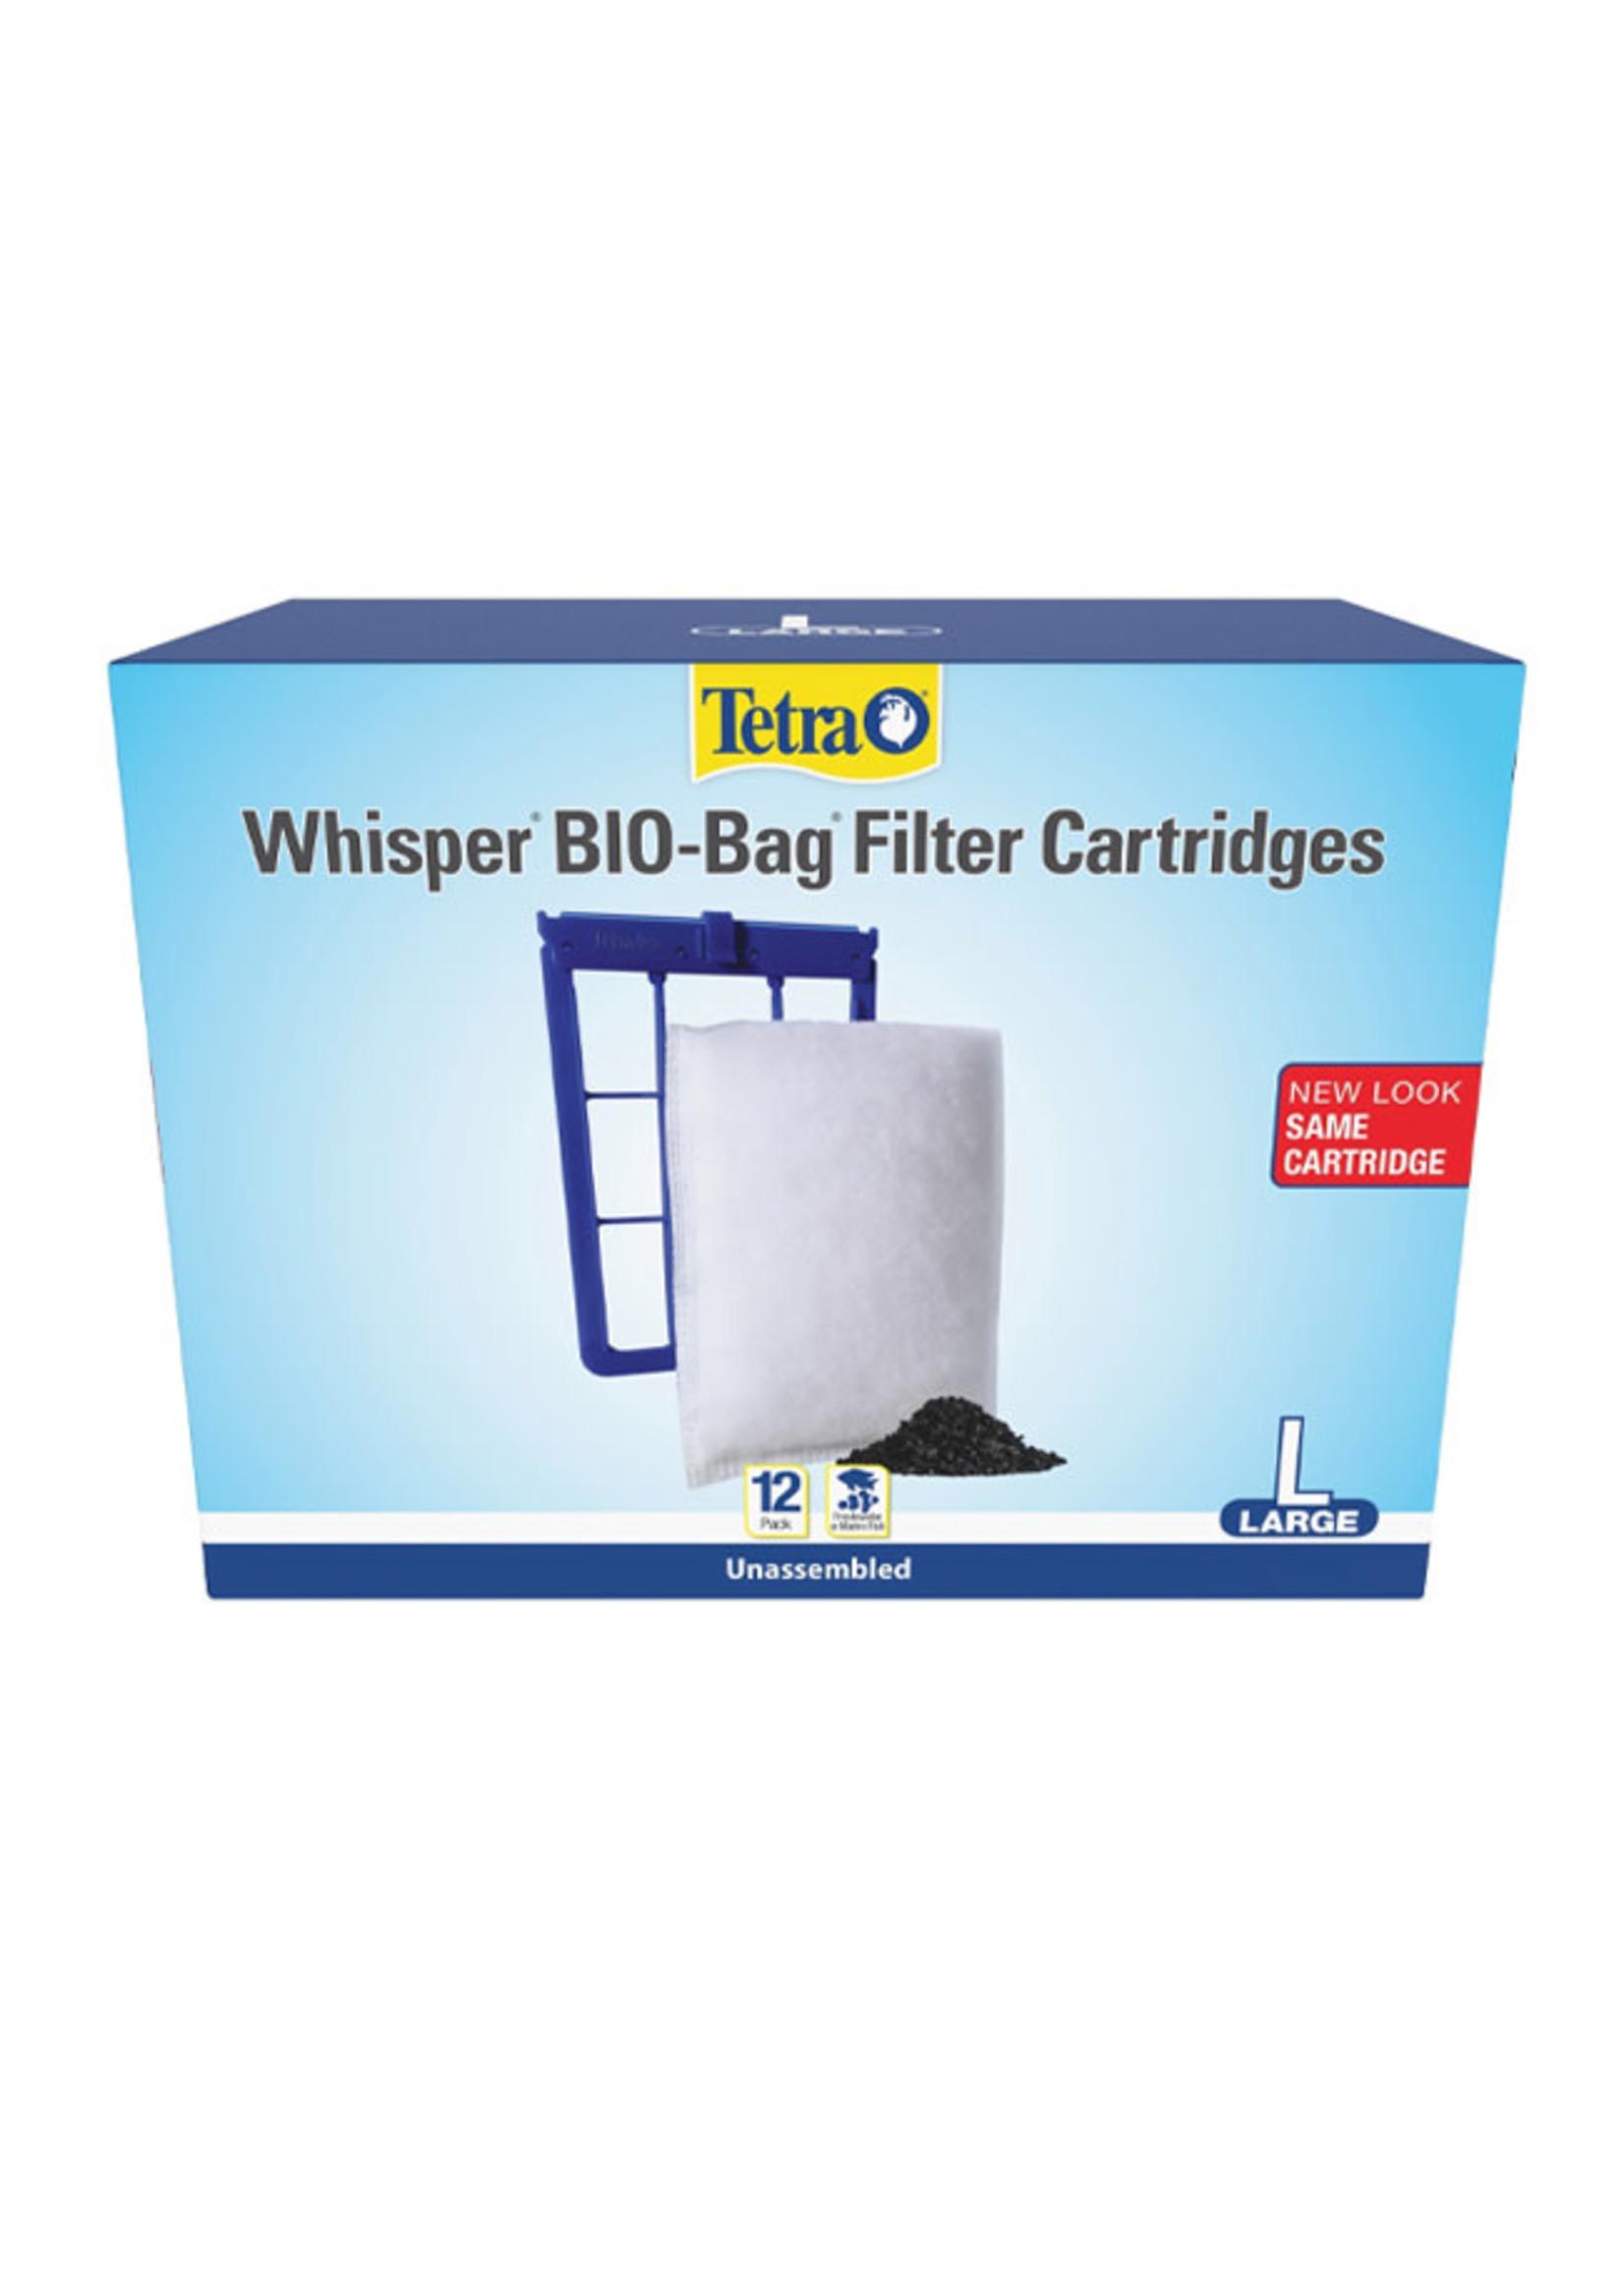 Tetra Tetra Whisper BIO-Bag Filter Cartridges Unassembled